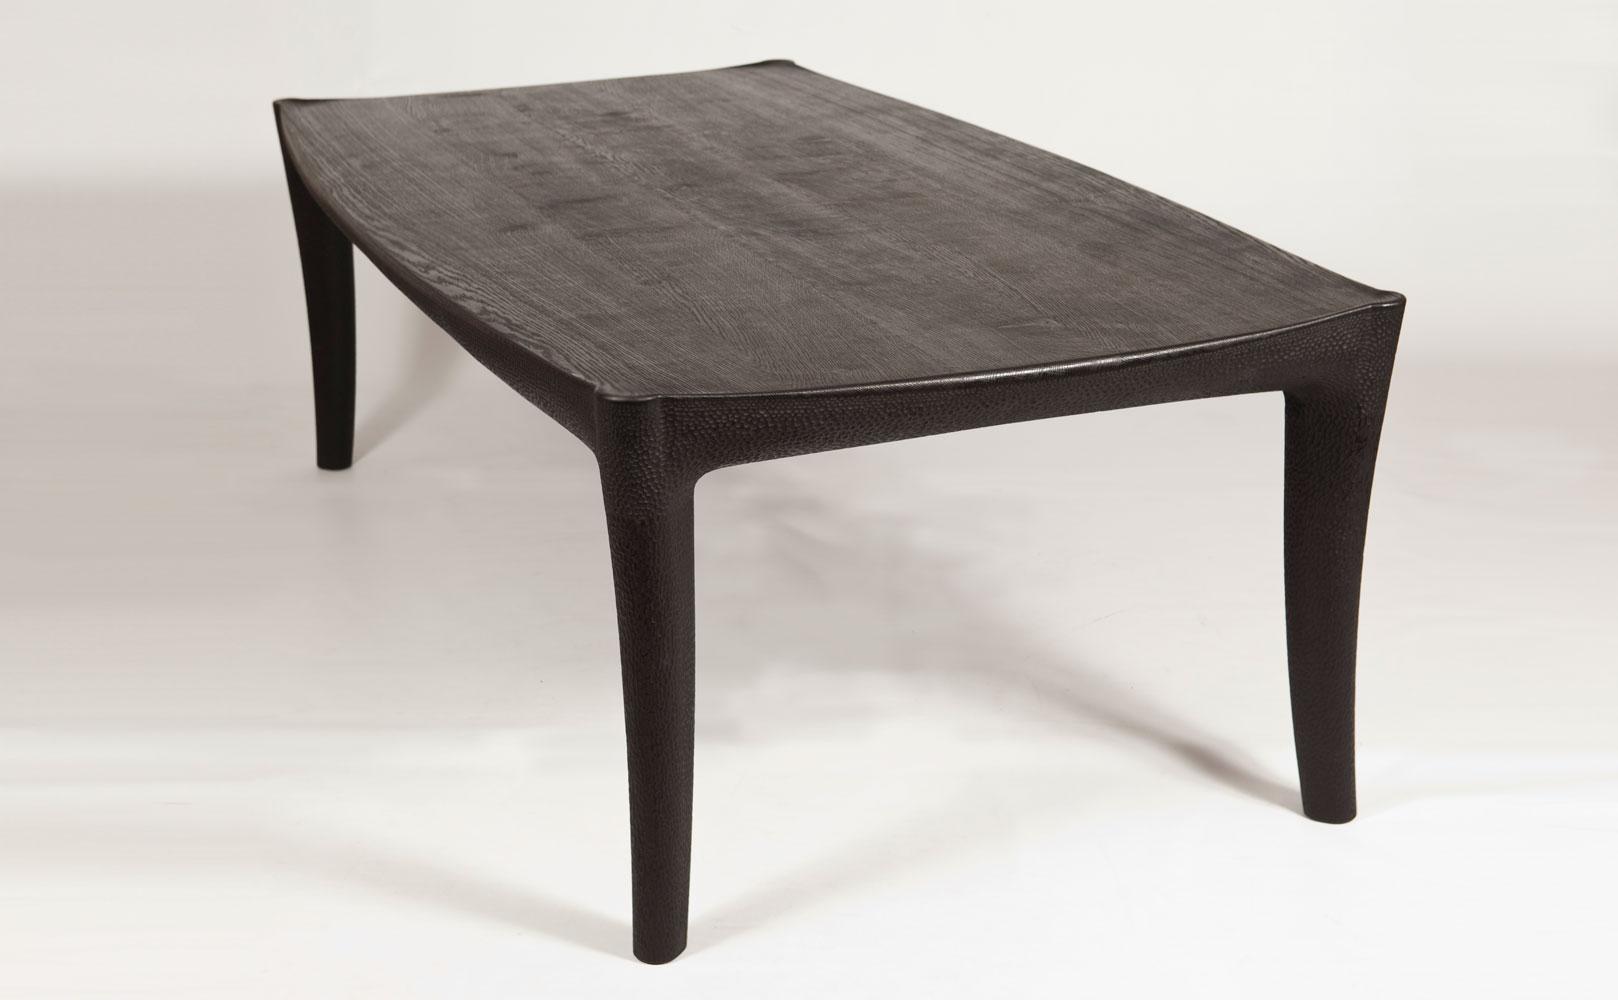 Scorched Oak Dining Table - Edward Barnsley Workshop